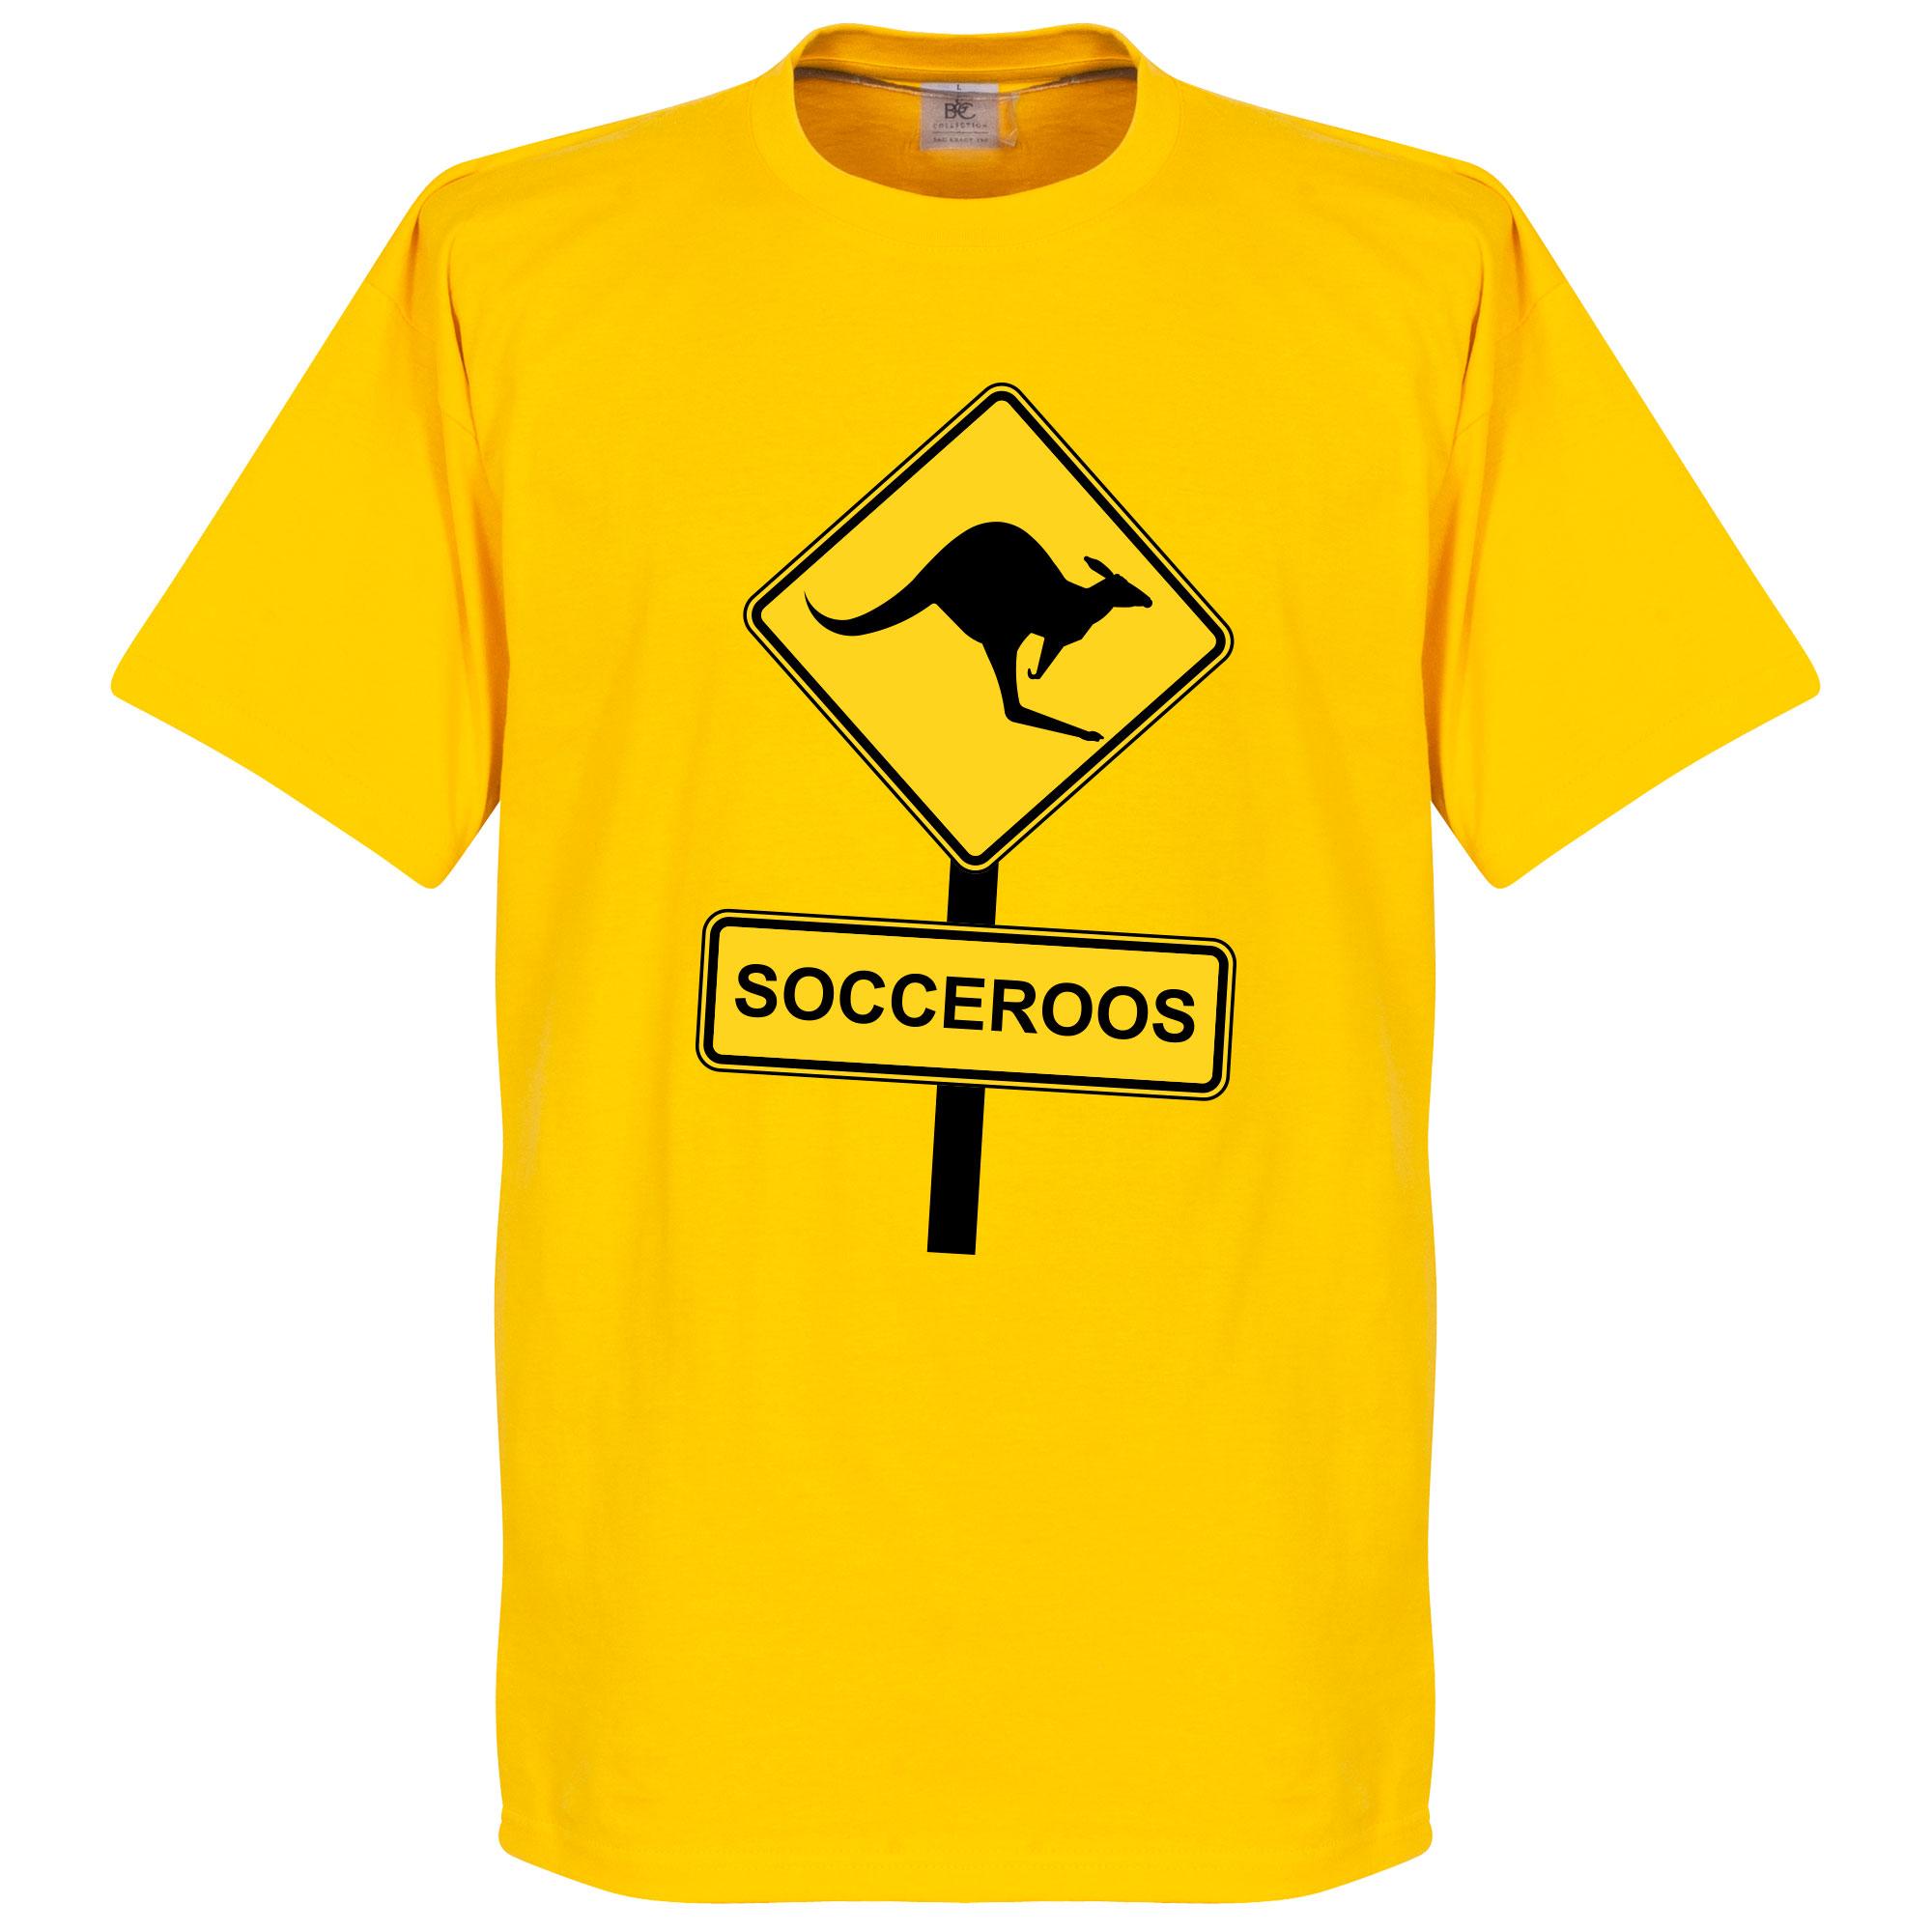 Socceroos Roadsign T-shirt